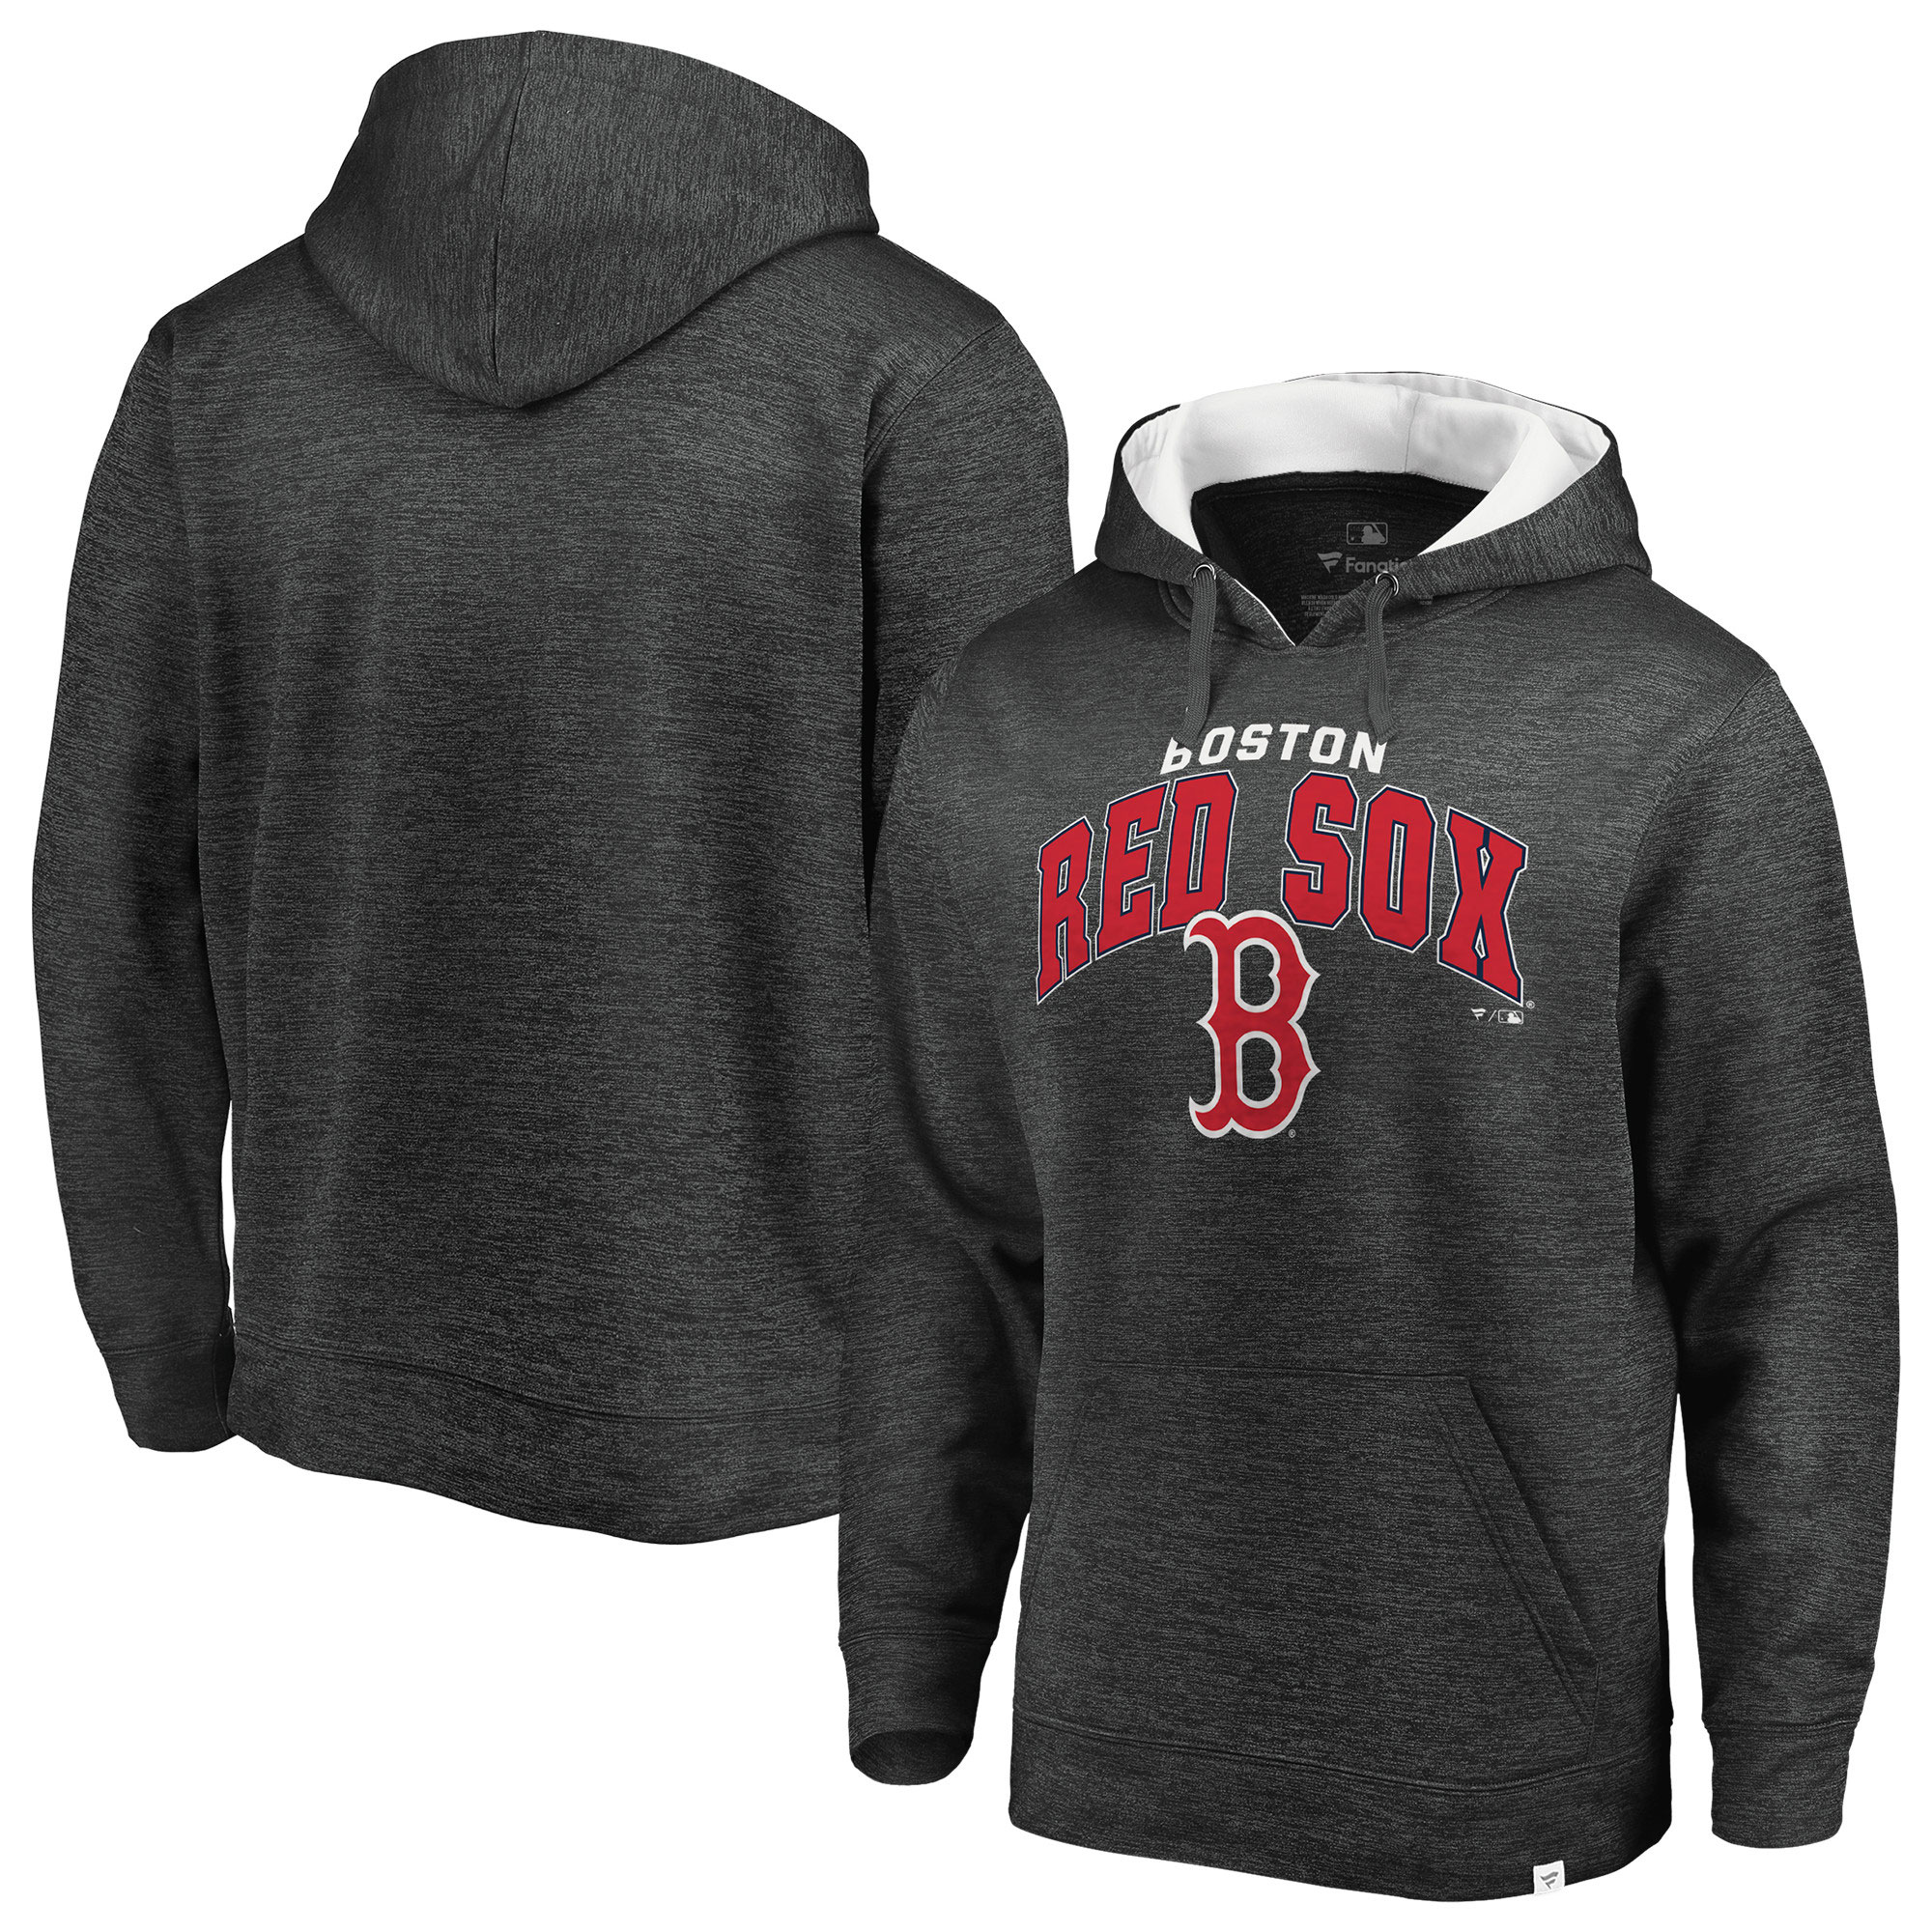 Boston Red Sox Fanatics Branded Steady Fleece Pullover Hoodie - Gray/White